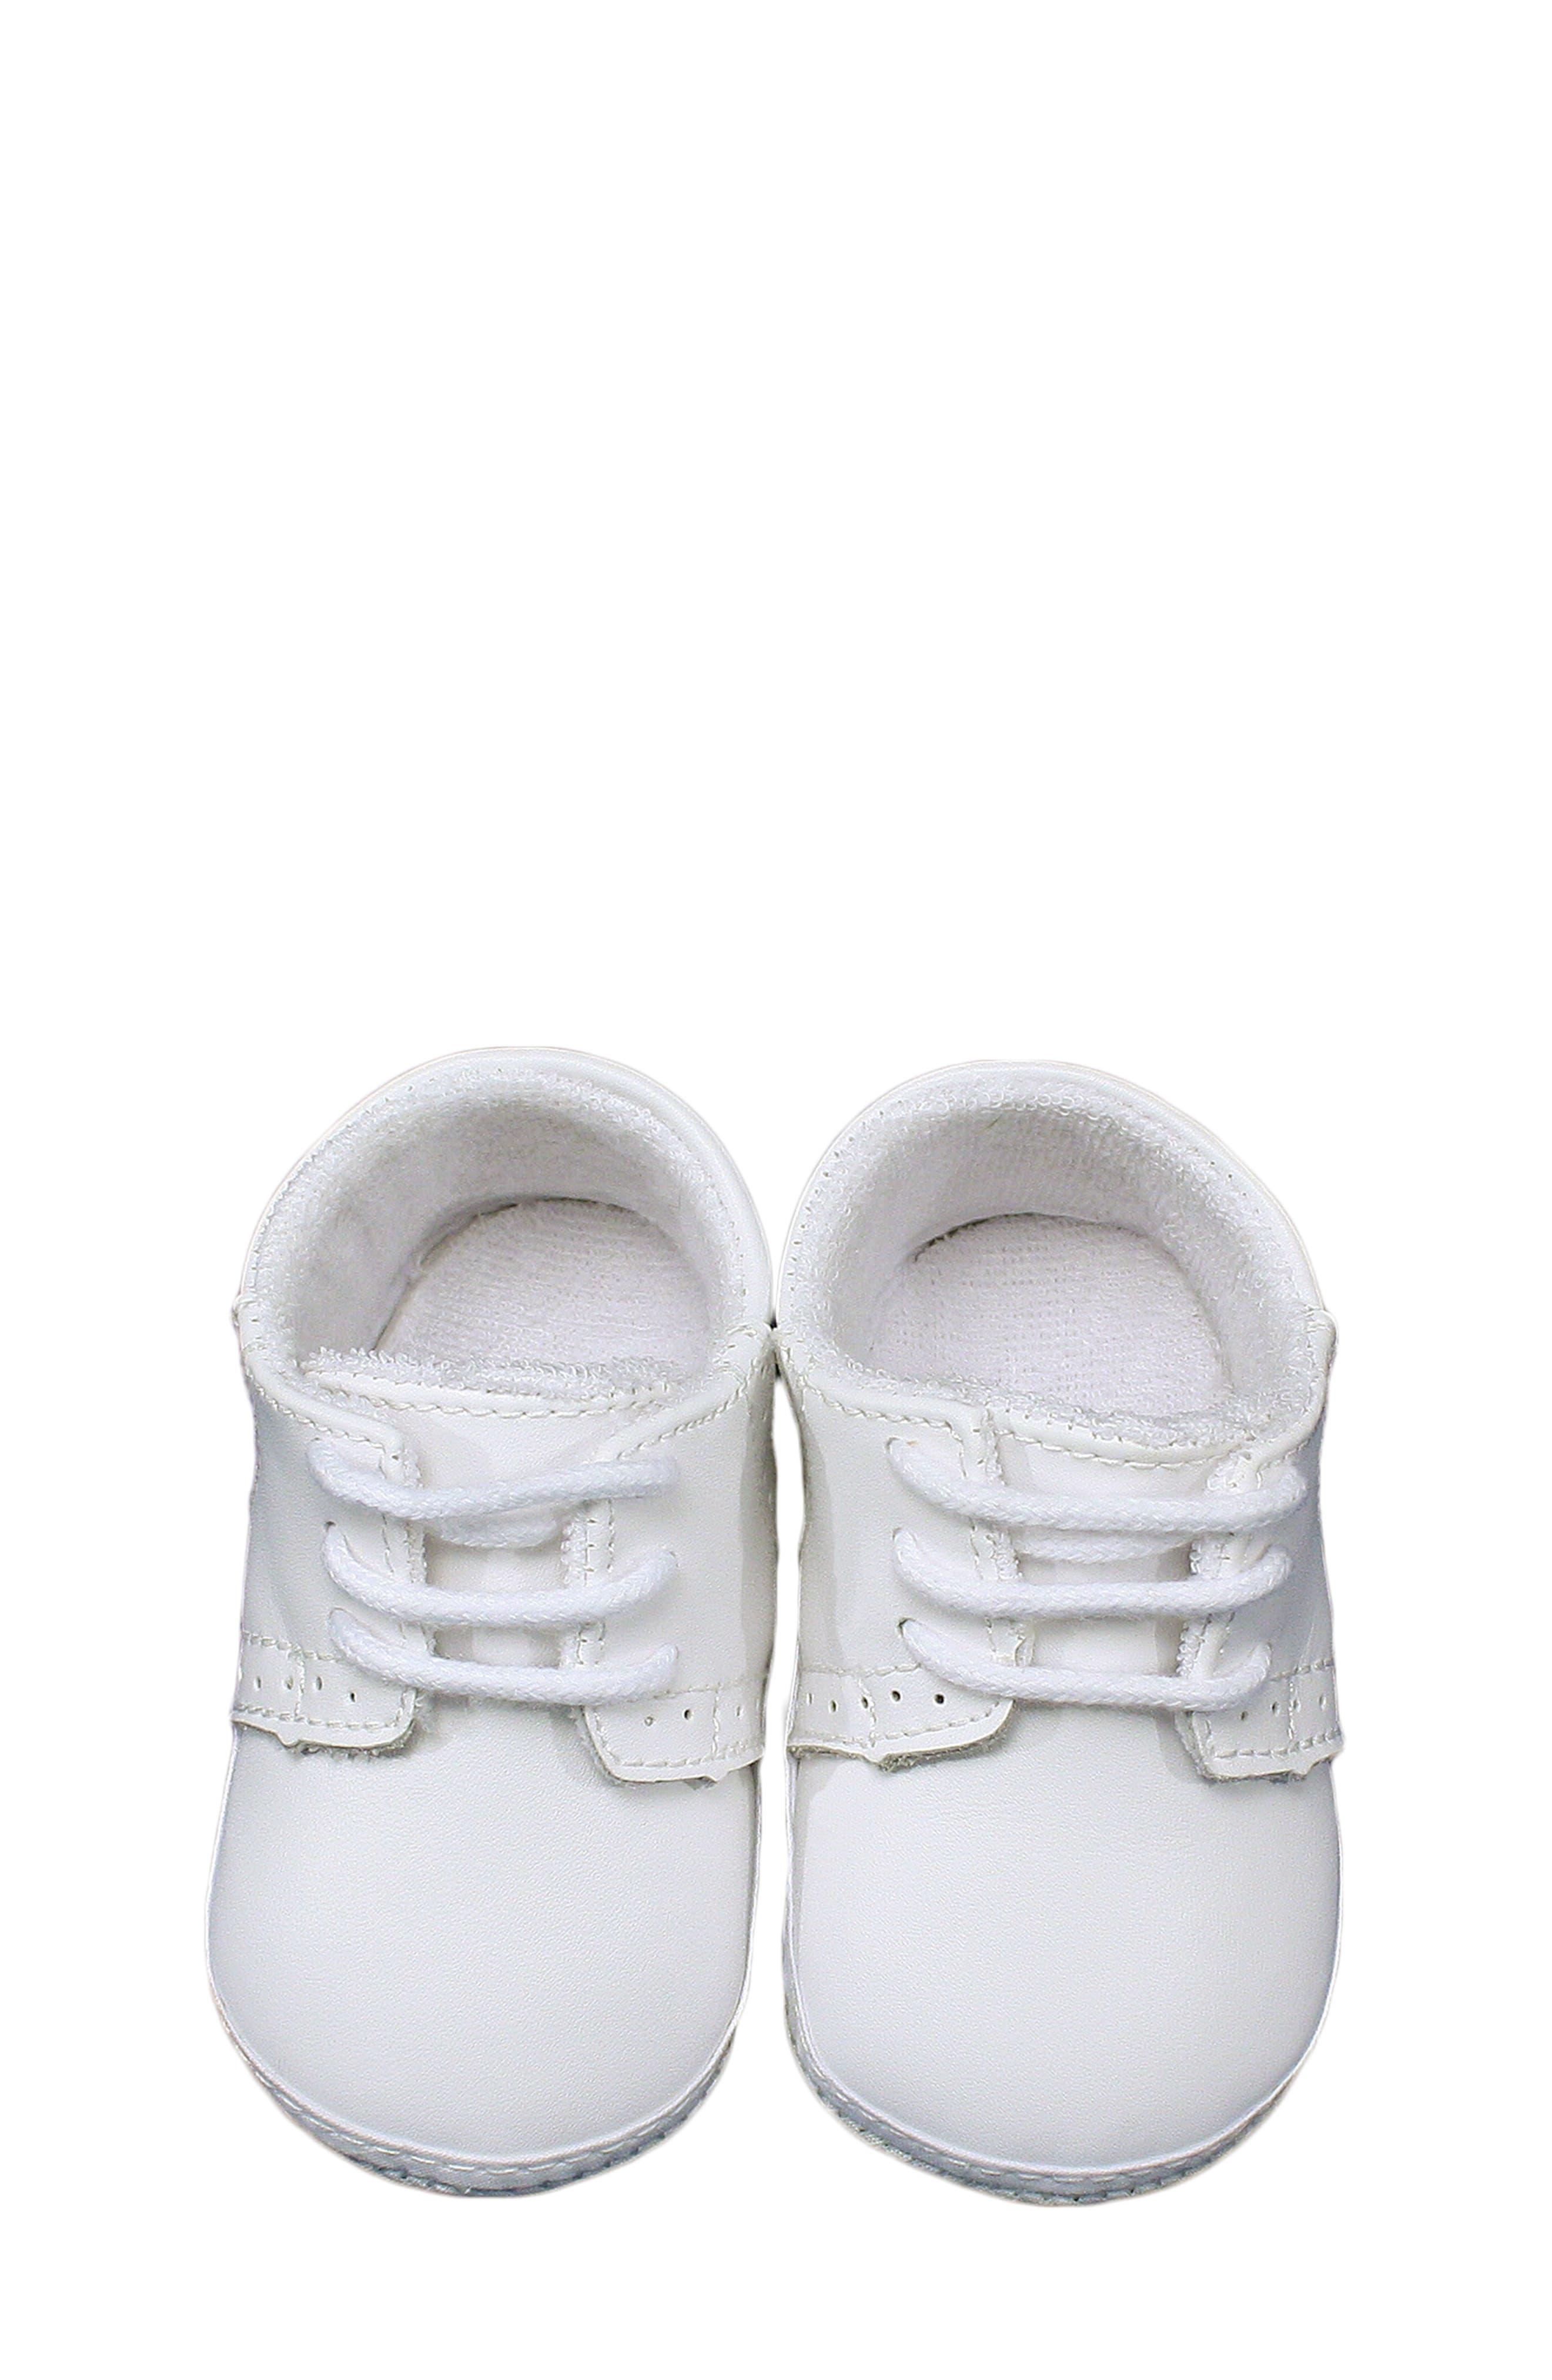 Leather Crib Shoe,                             Main thumbnail 1, color,                             White